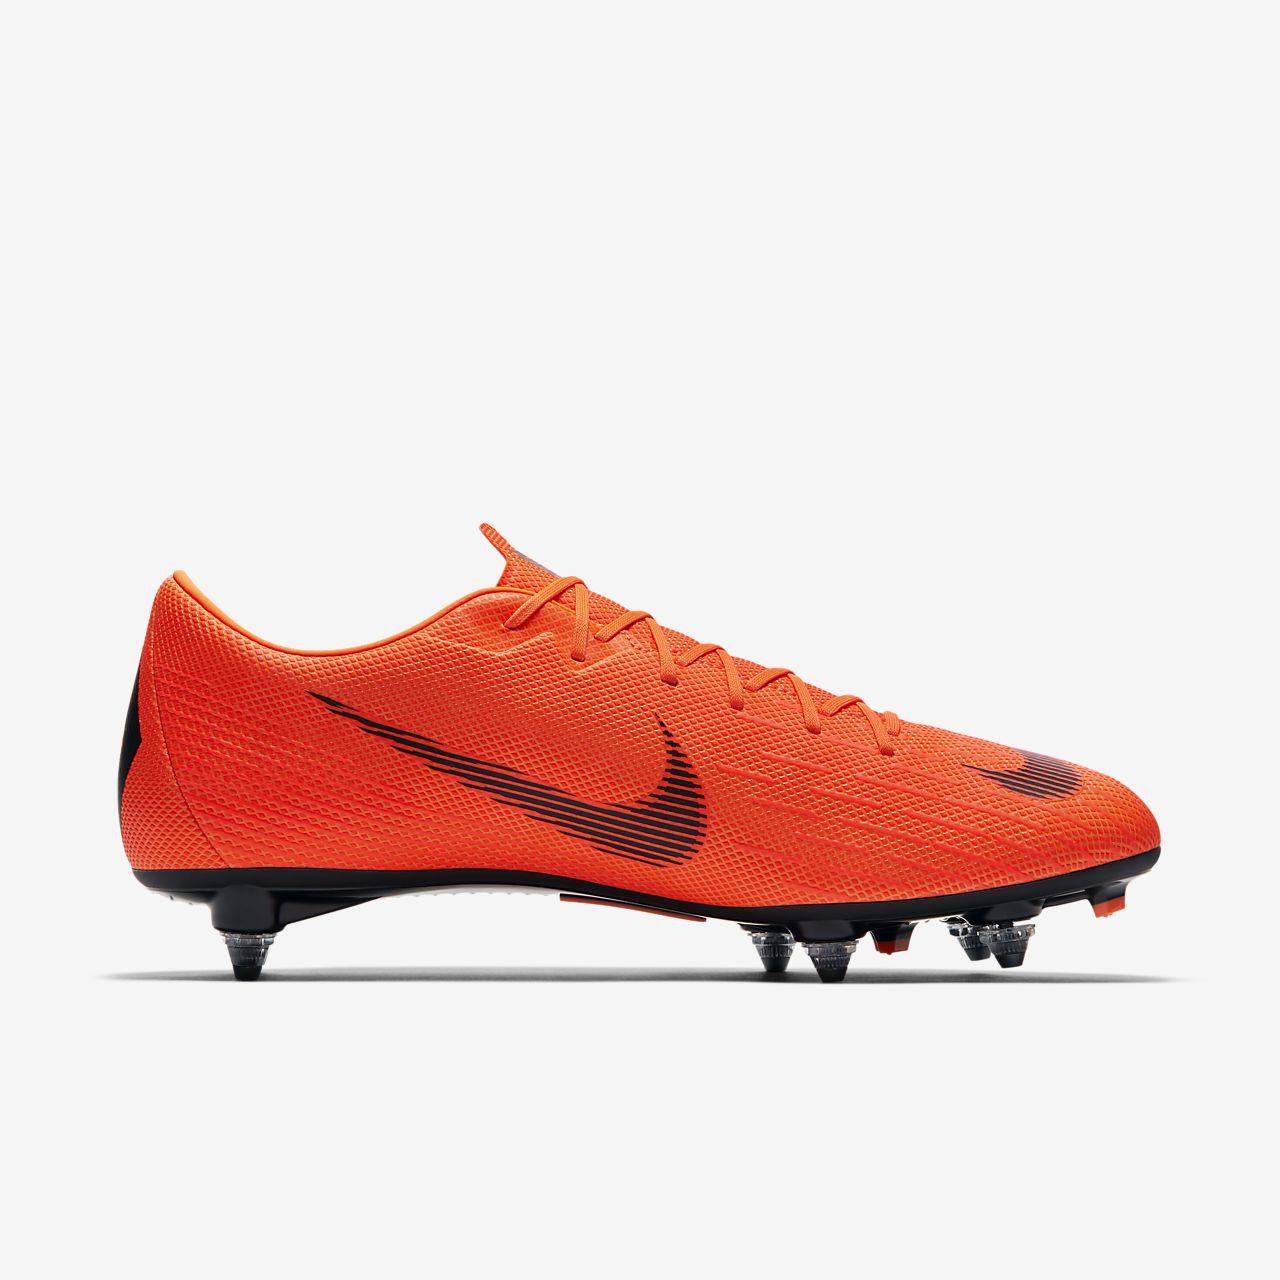 b26653bad0c1 Compare. Nike Mercurial Vapor XII Academy SG-PRO Football Boot Junior